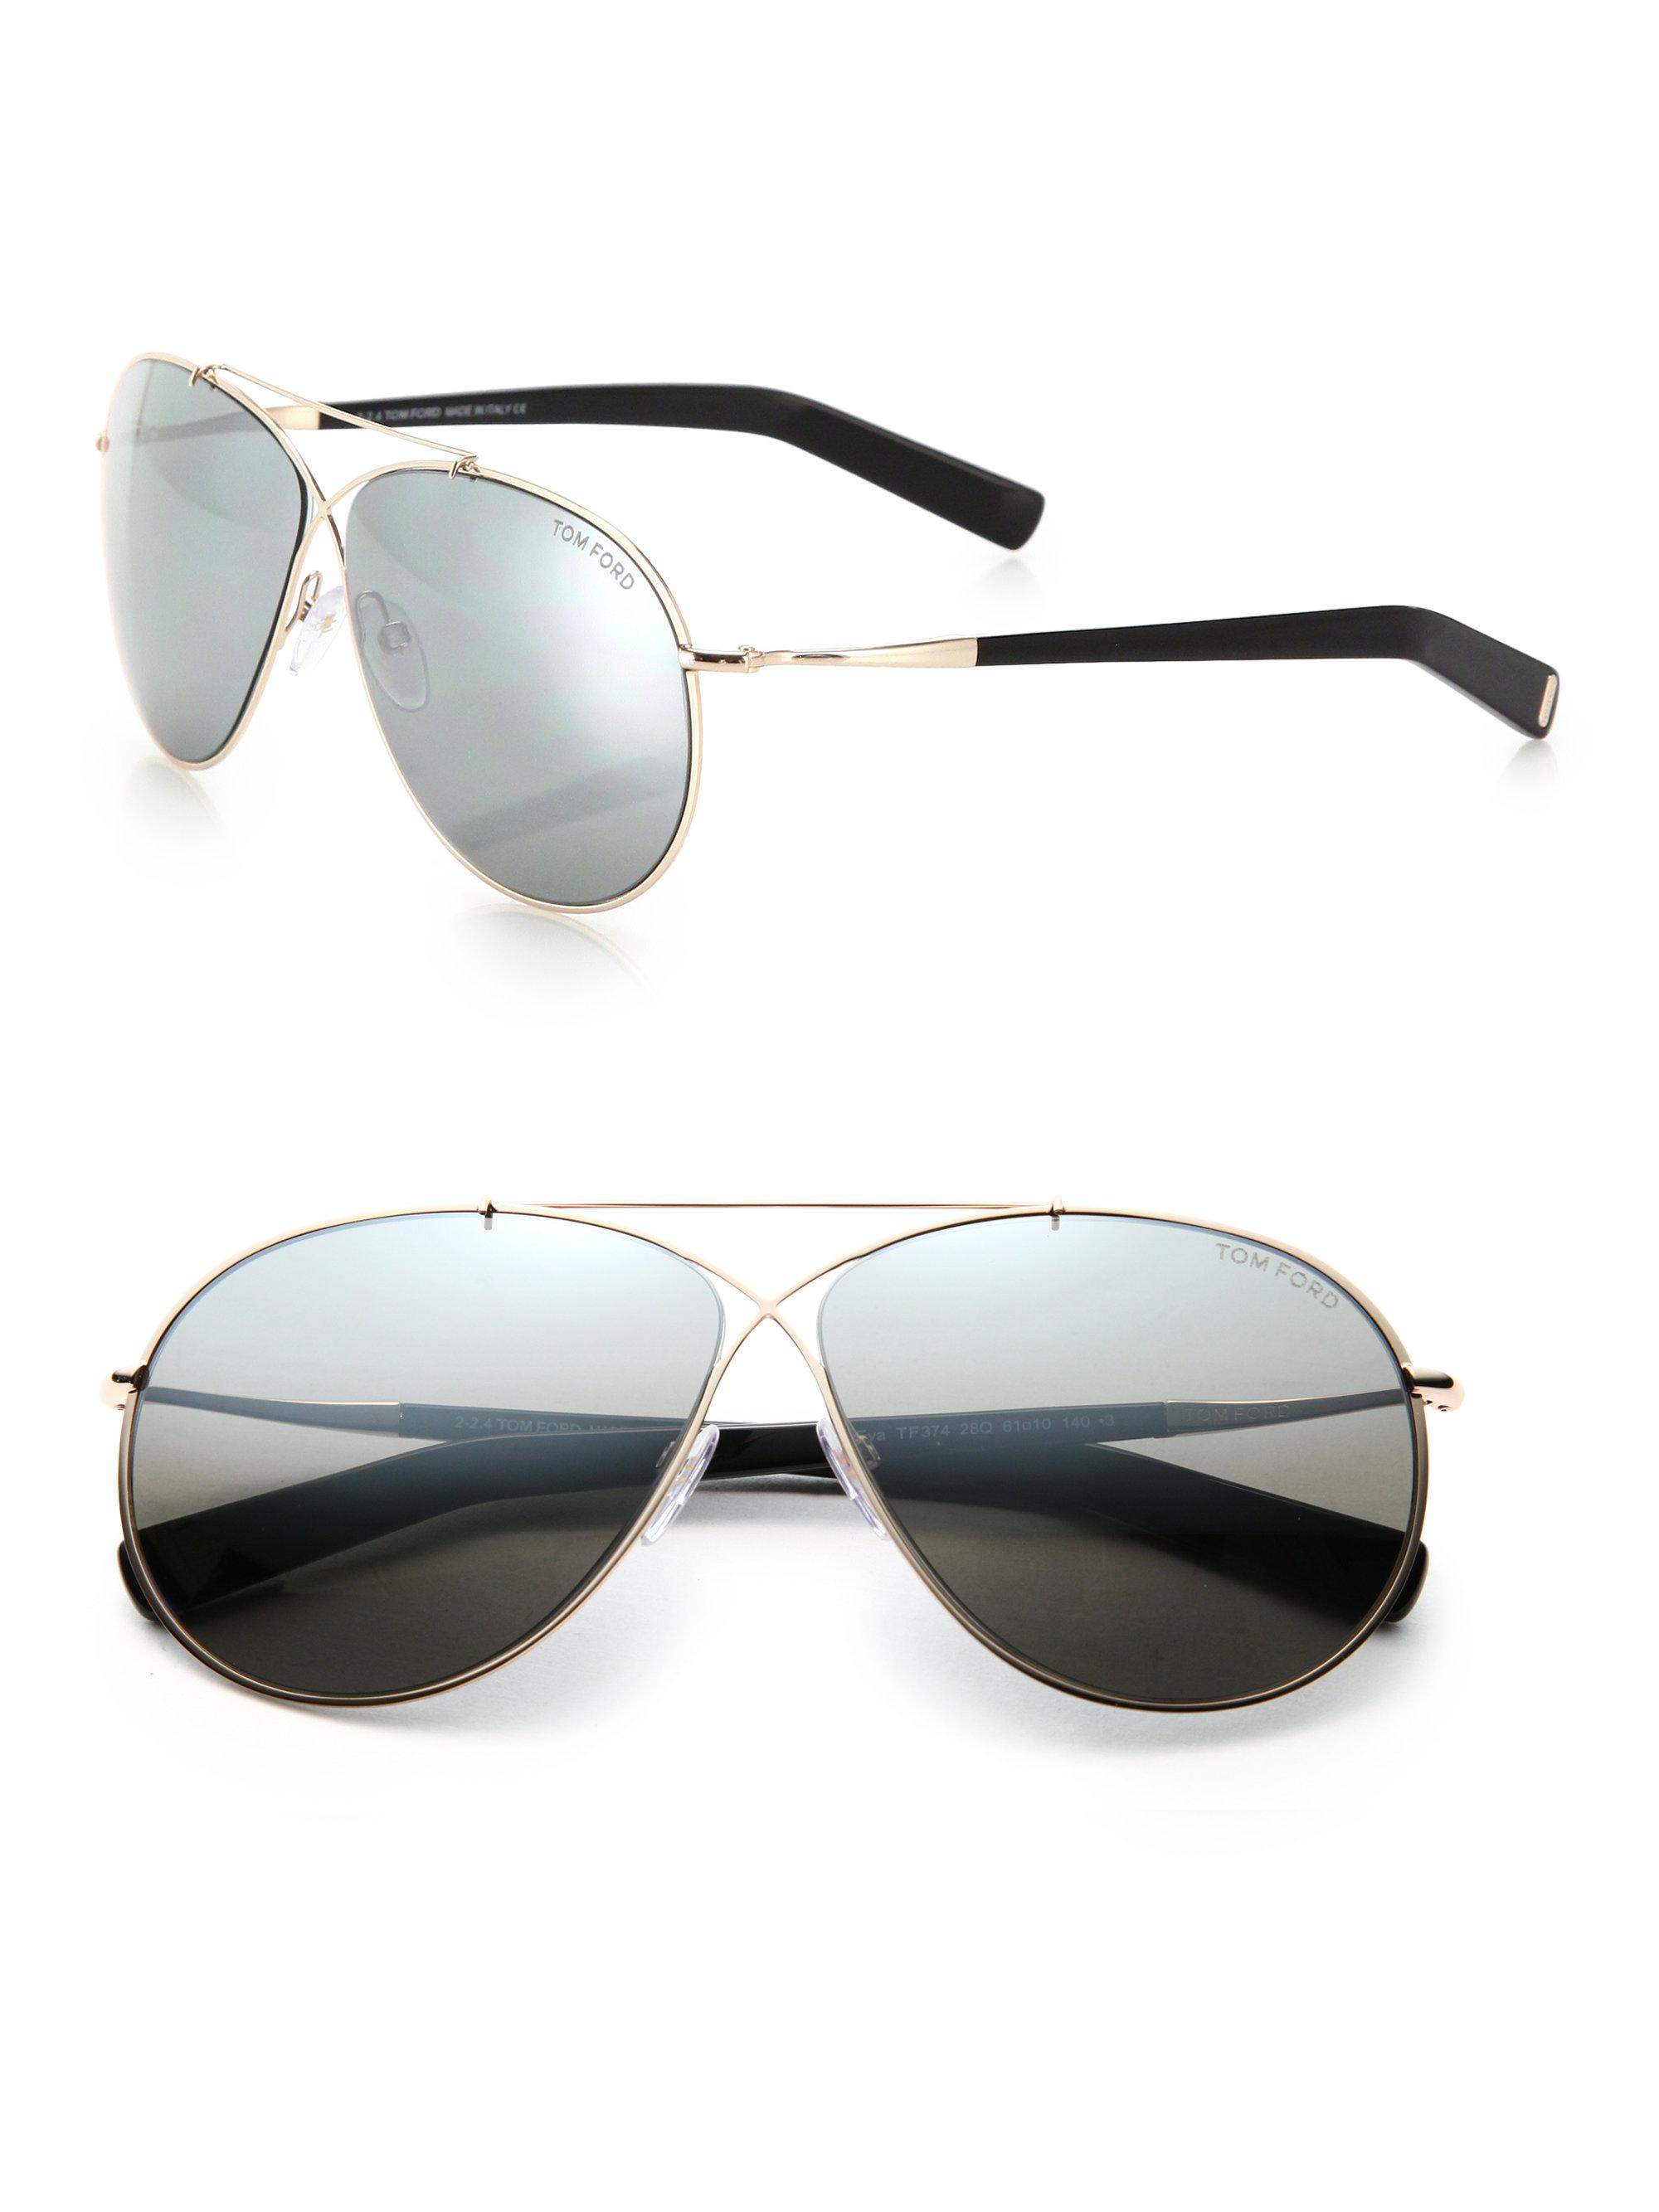 a0ec477797 Tom Ford Eva 61mm Pilot Sunglasses in Metallic - Lyst